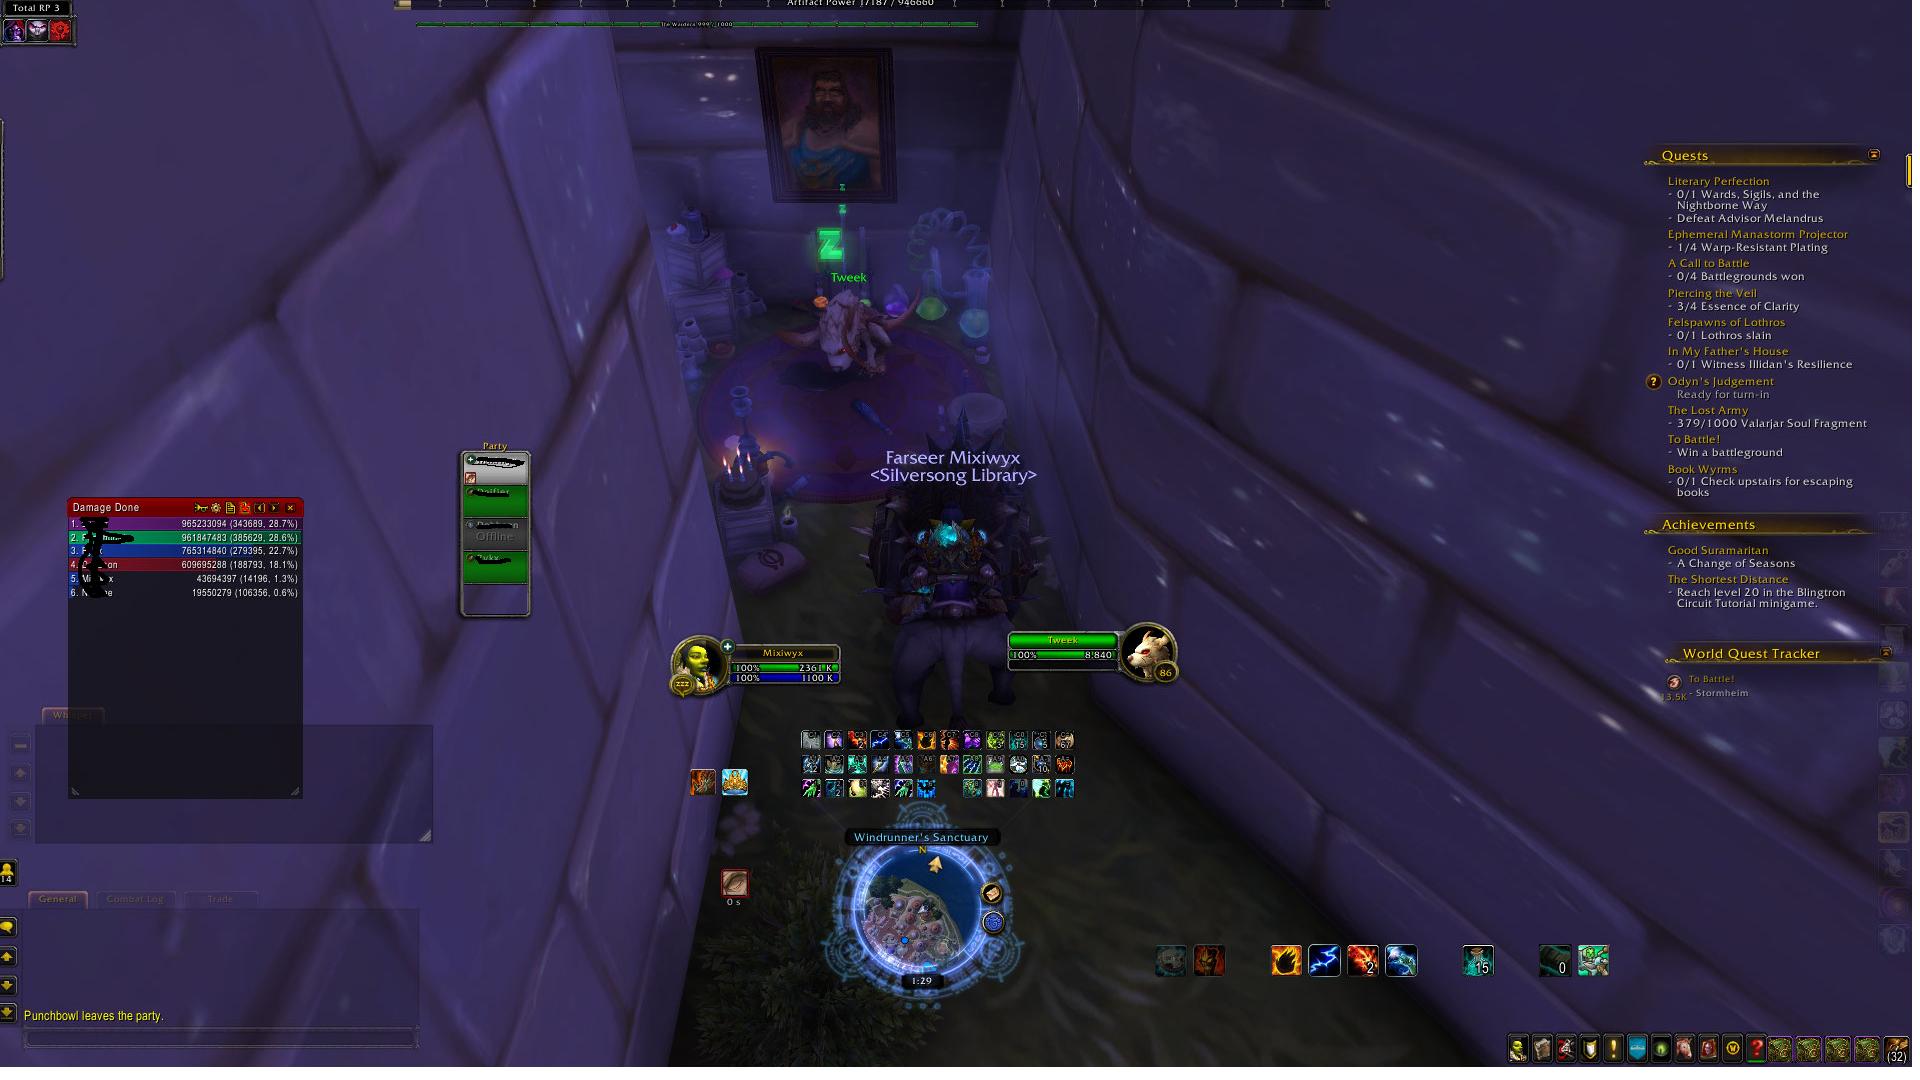 Why is this bunny in Dalaran? Tweek was in Panda. #worldofwarcraft #blizzard #Hearthstone #wow #Warcraft #BlizzardCS #gaming